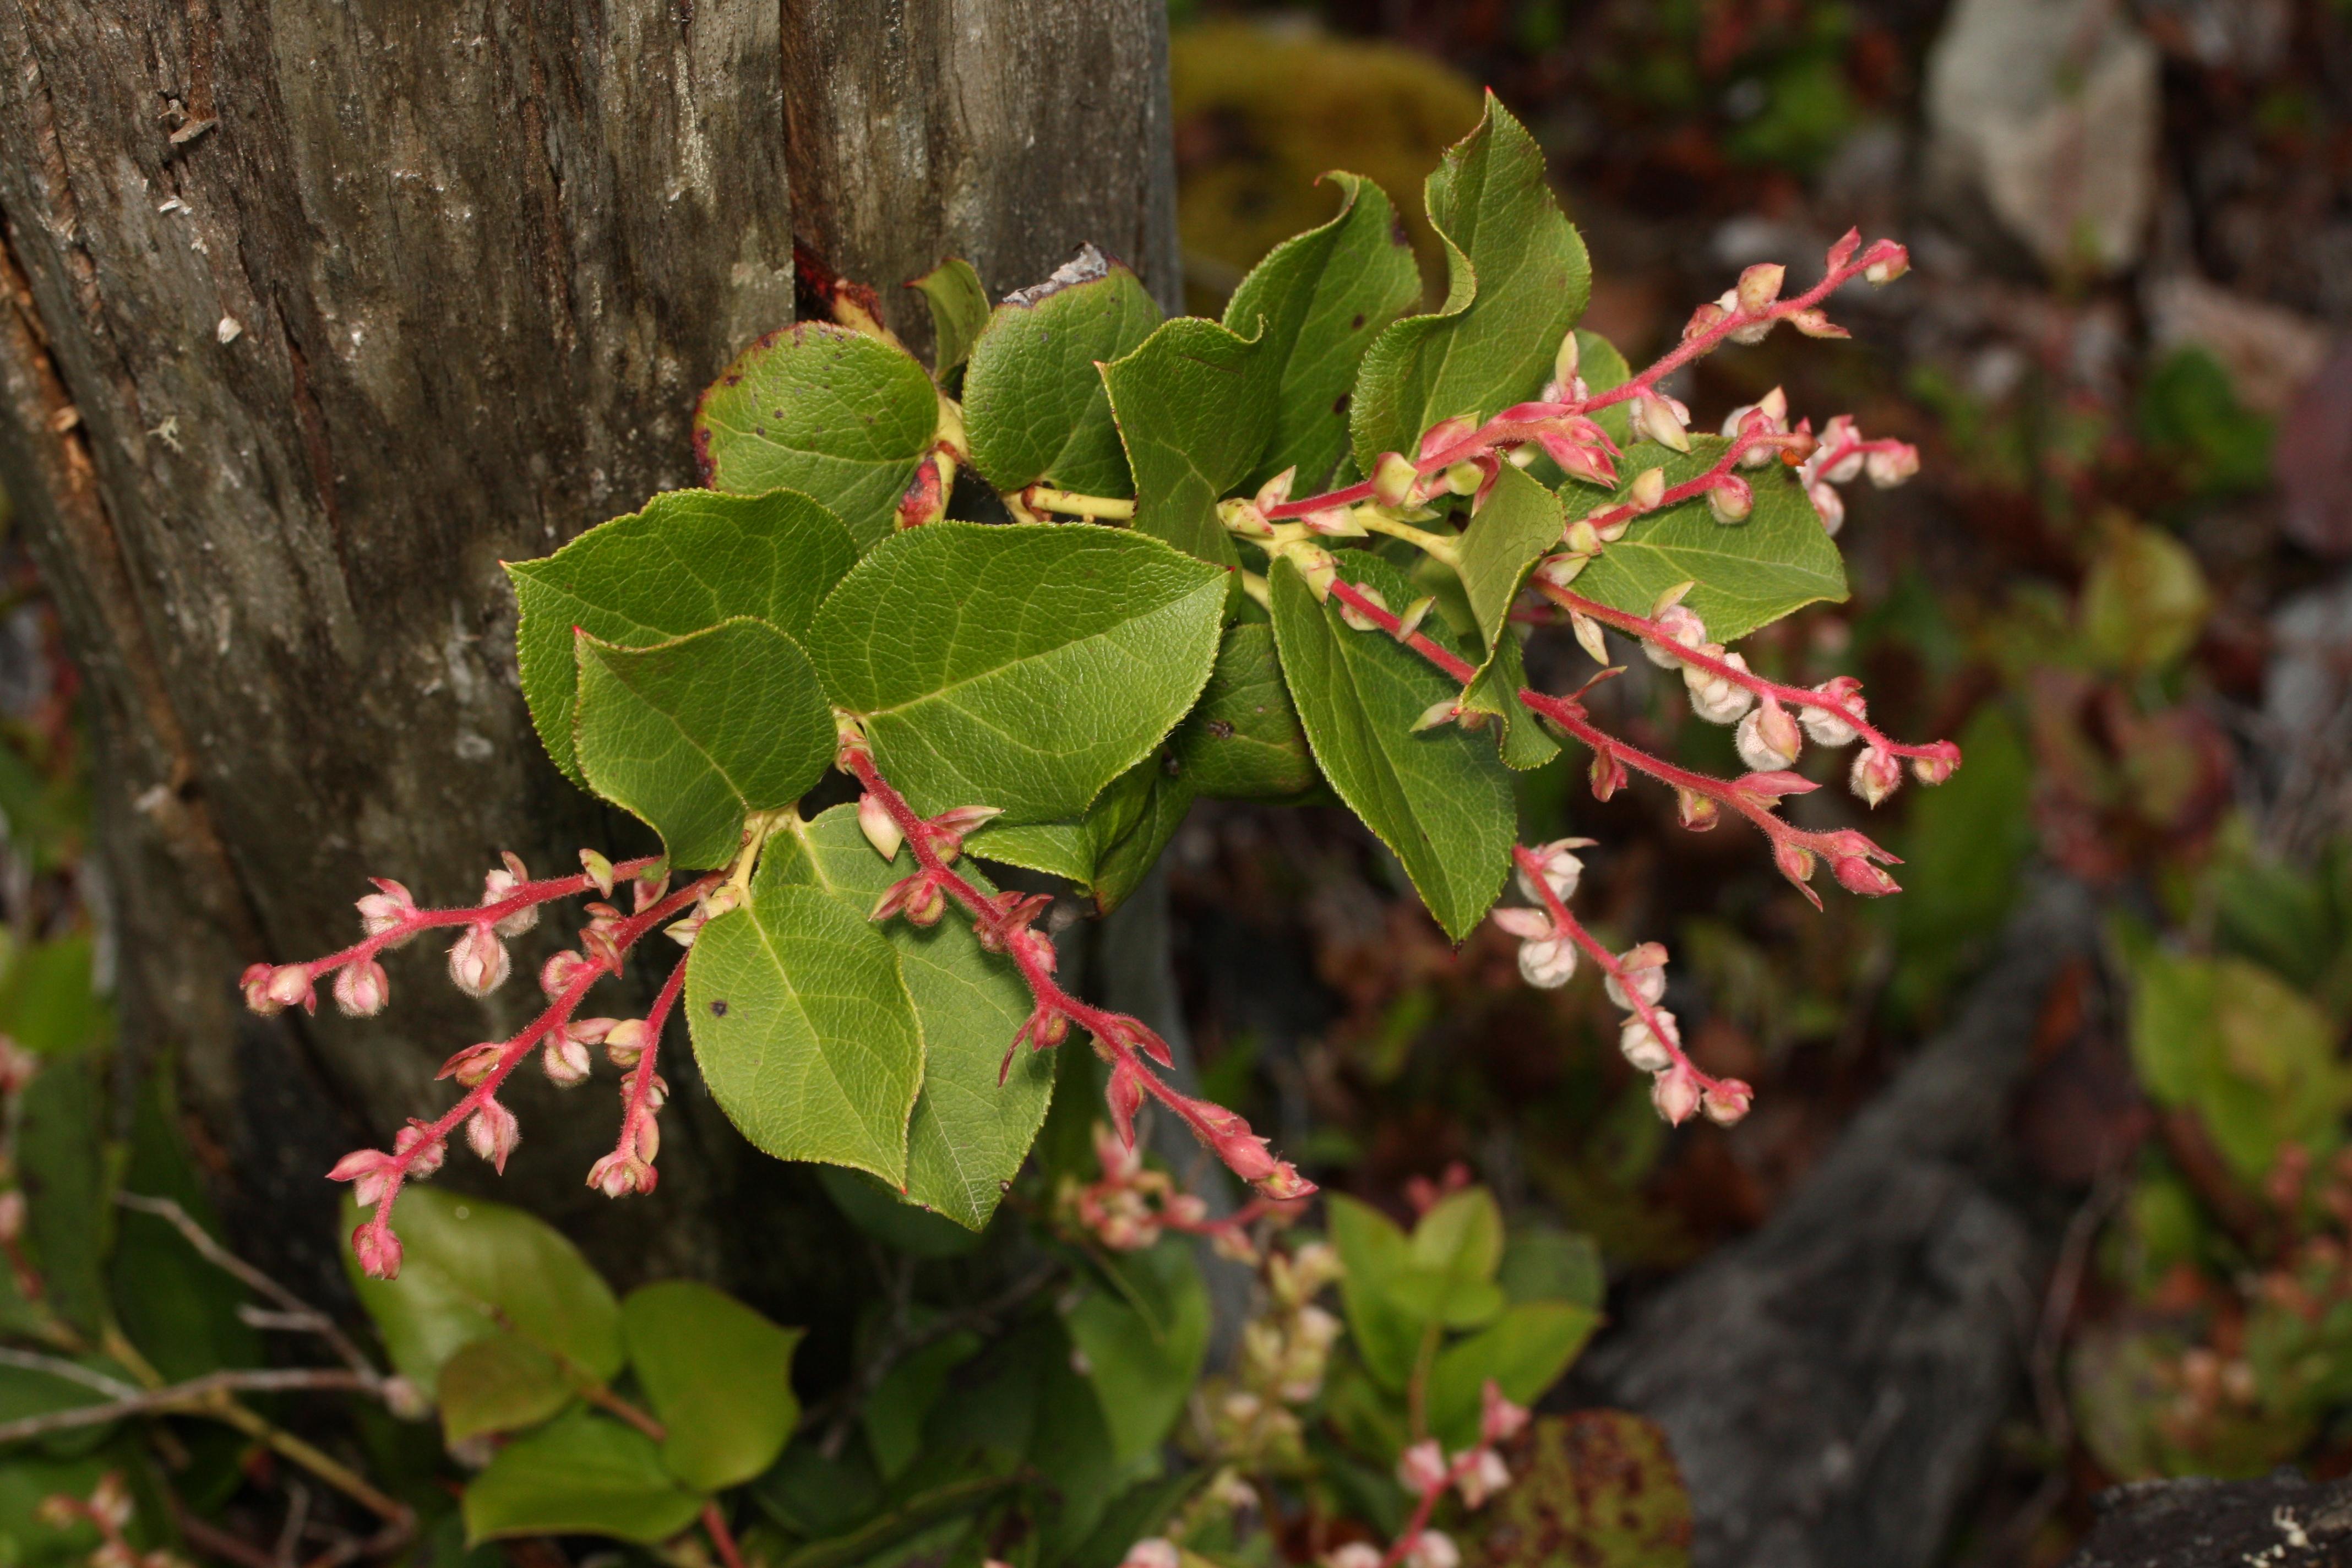 File:Gaultheria shallon 1676.JPG - Wikimedia Commons